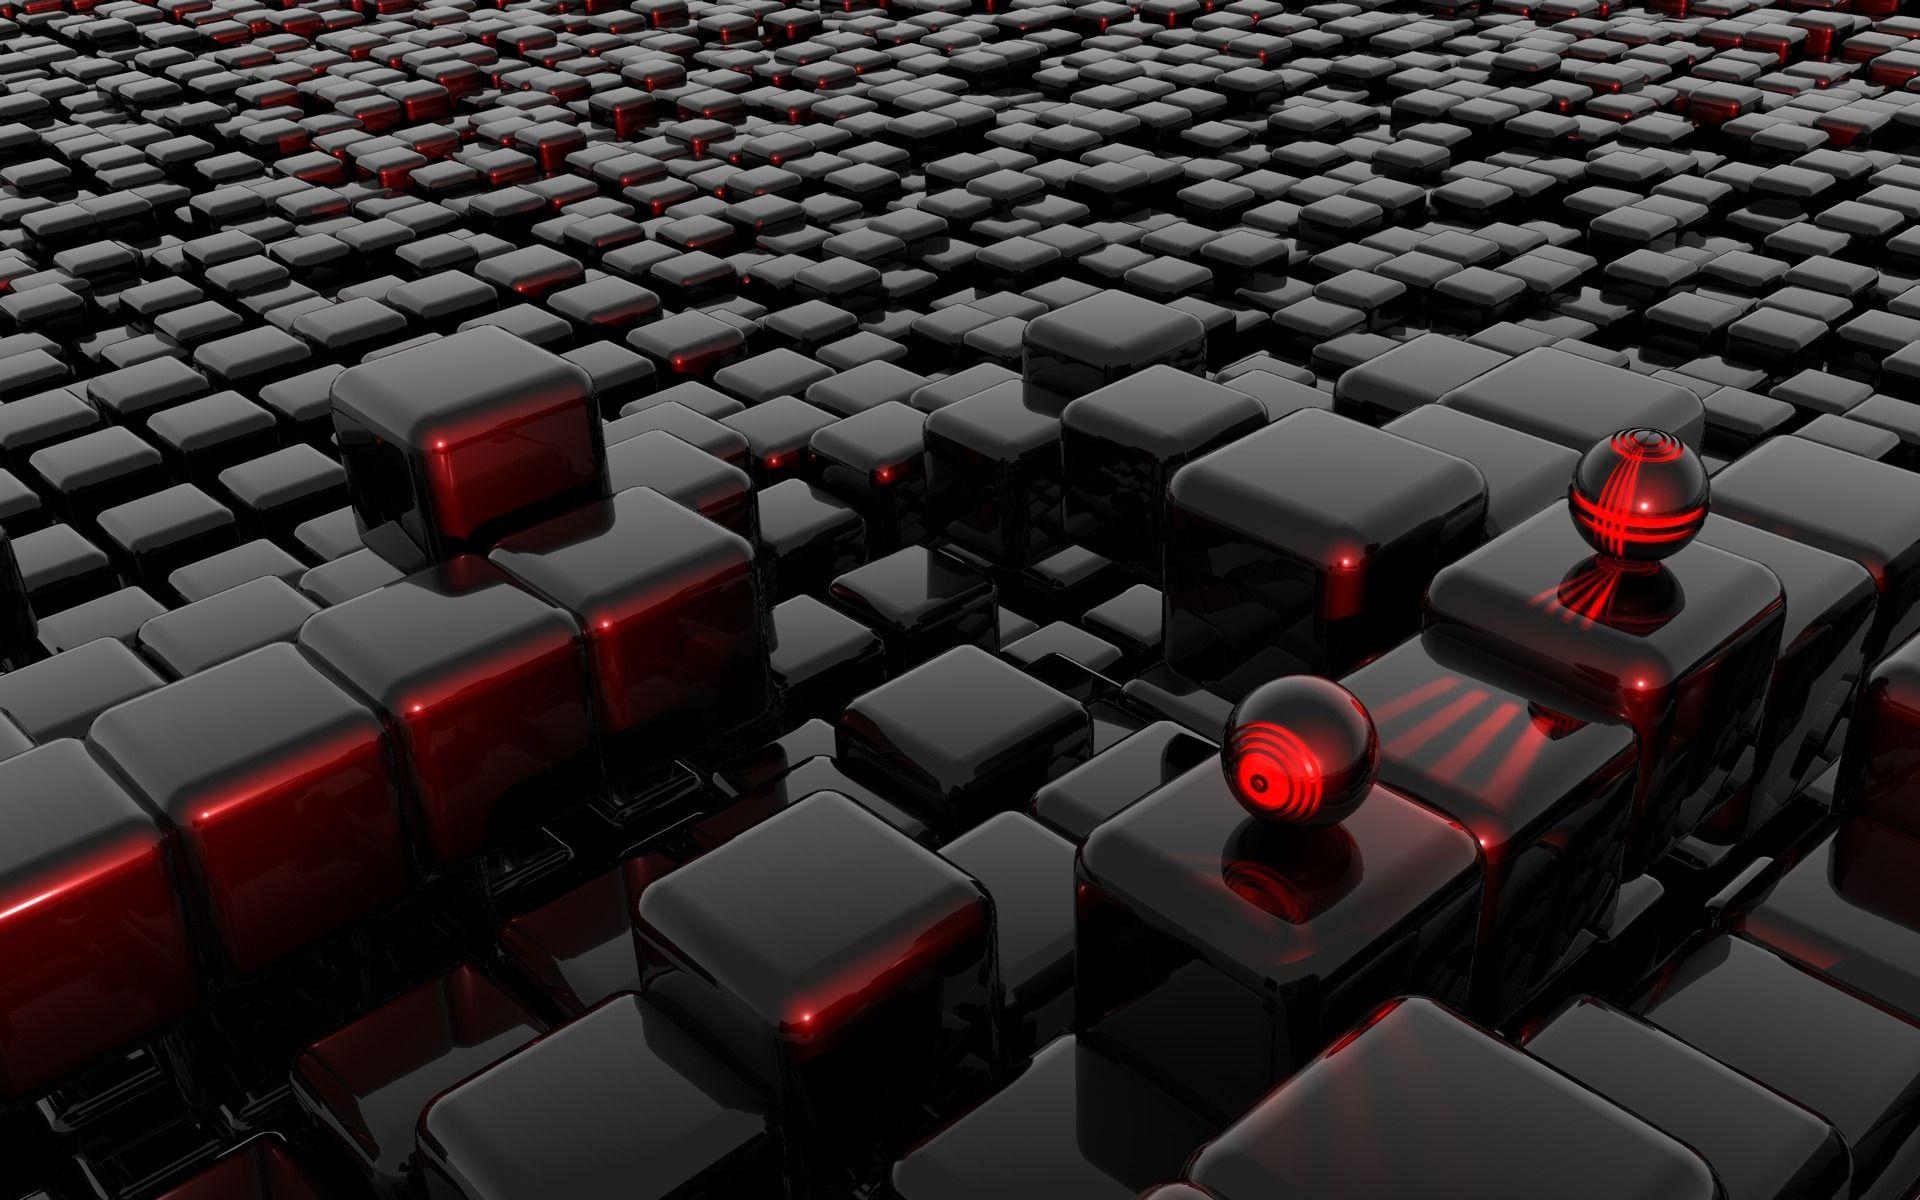 3d wallpaper | the cube 3d wallpaper | stuff to buy | pinterest